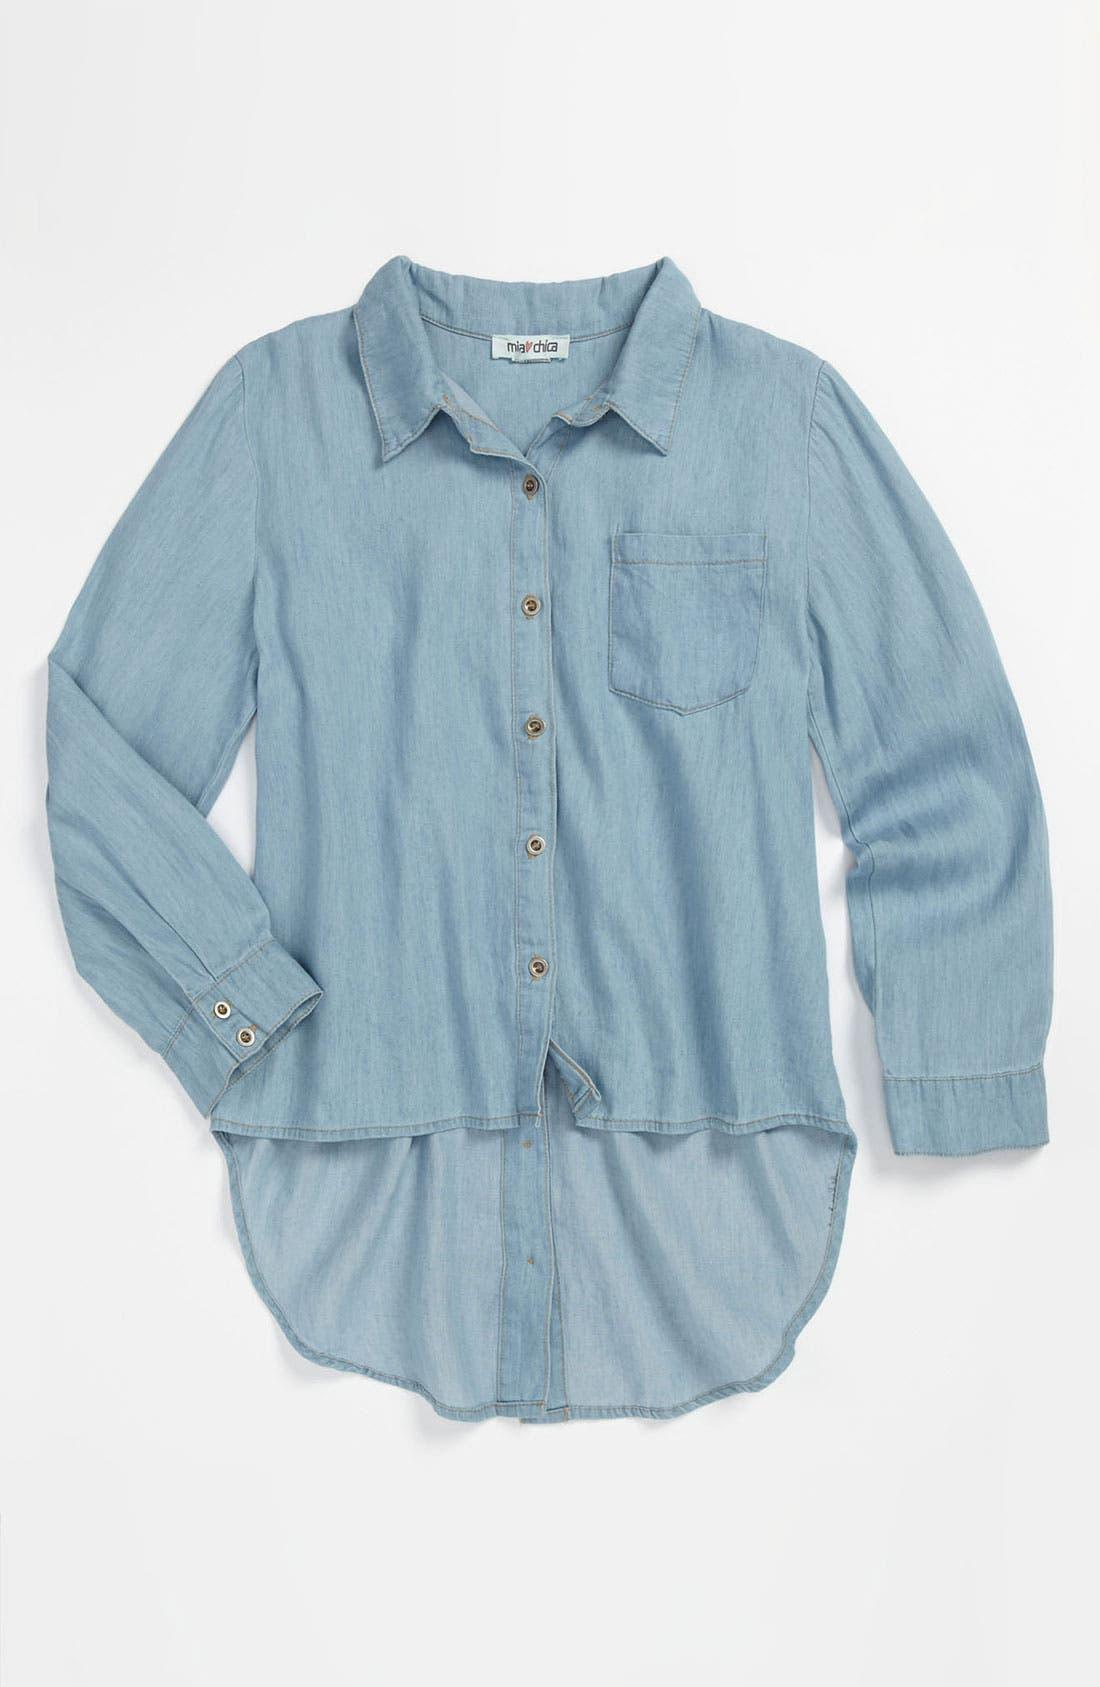 Main Image - Mia Chica Chambray Shirt (Big Girls)